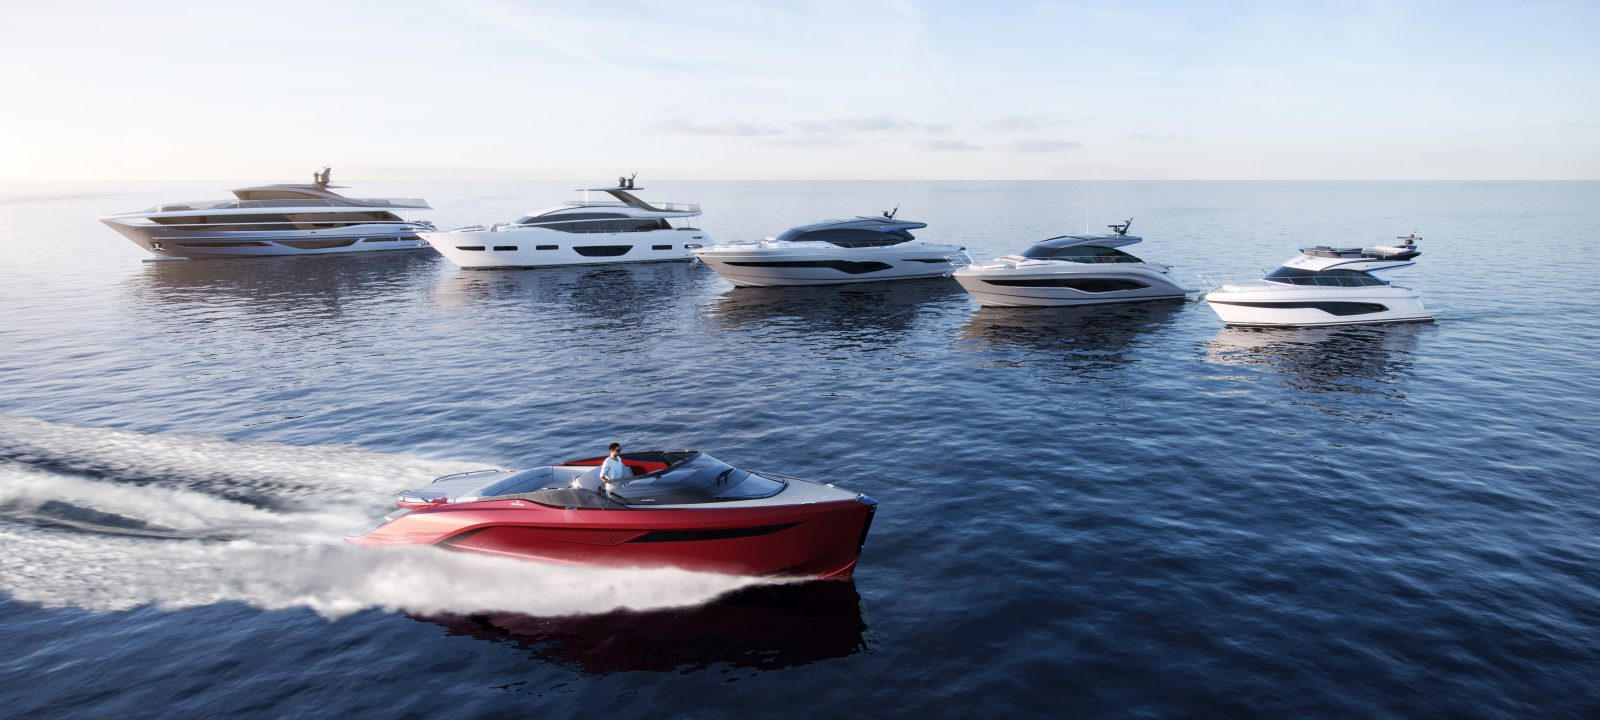 Six new yachts